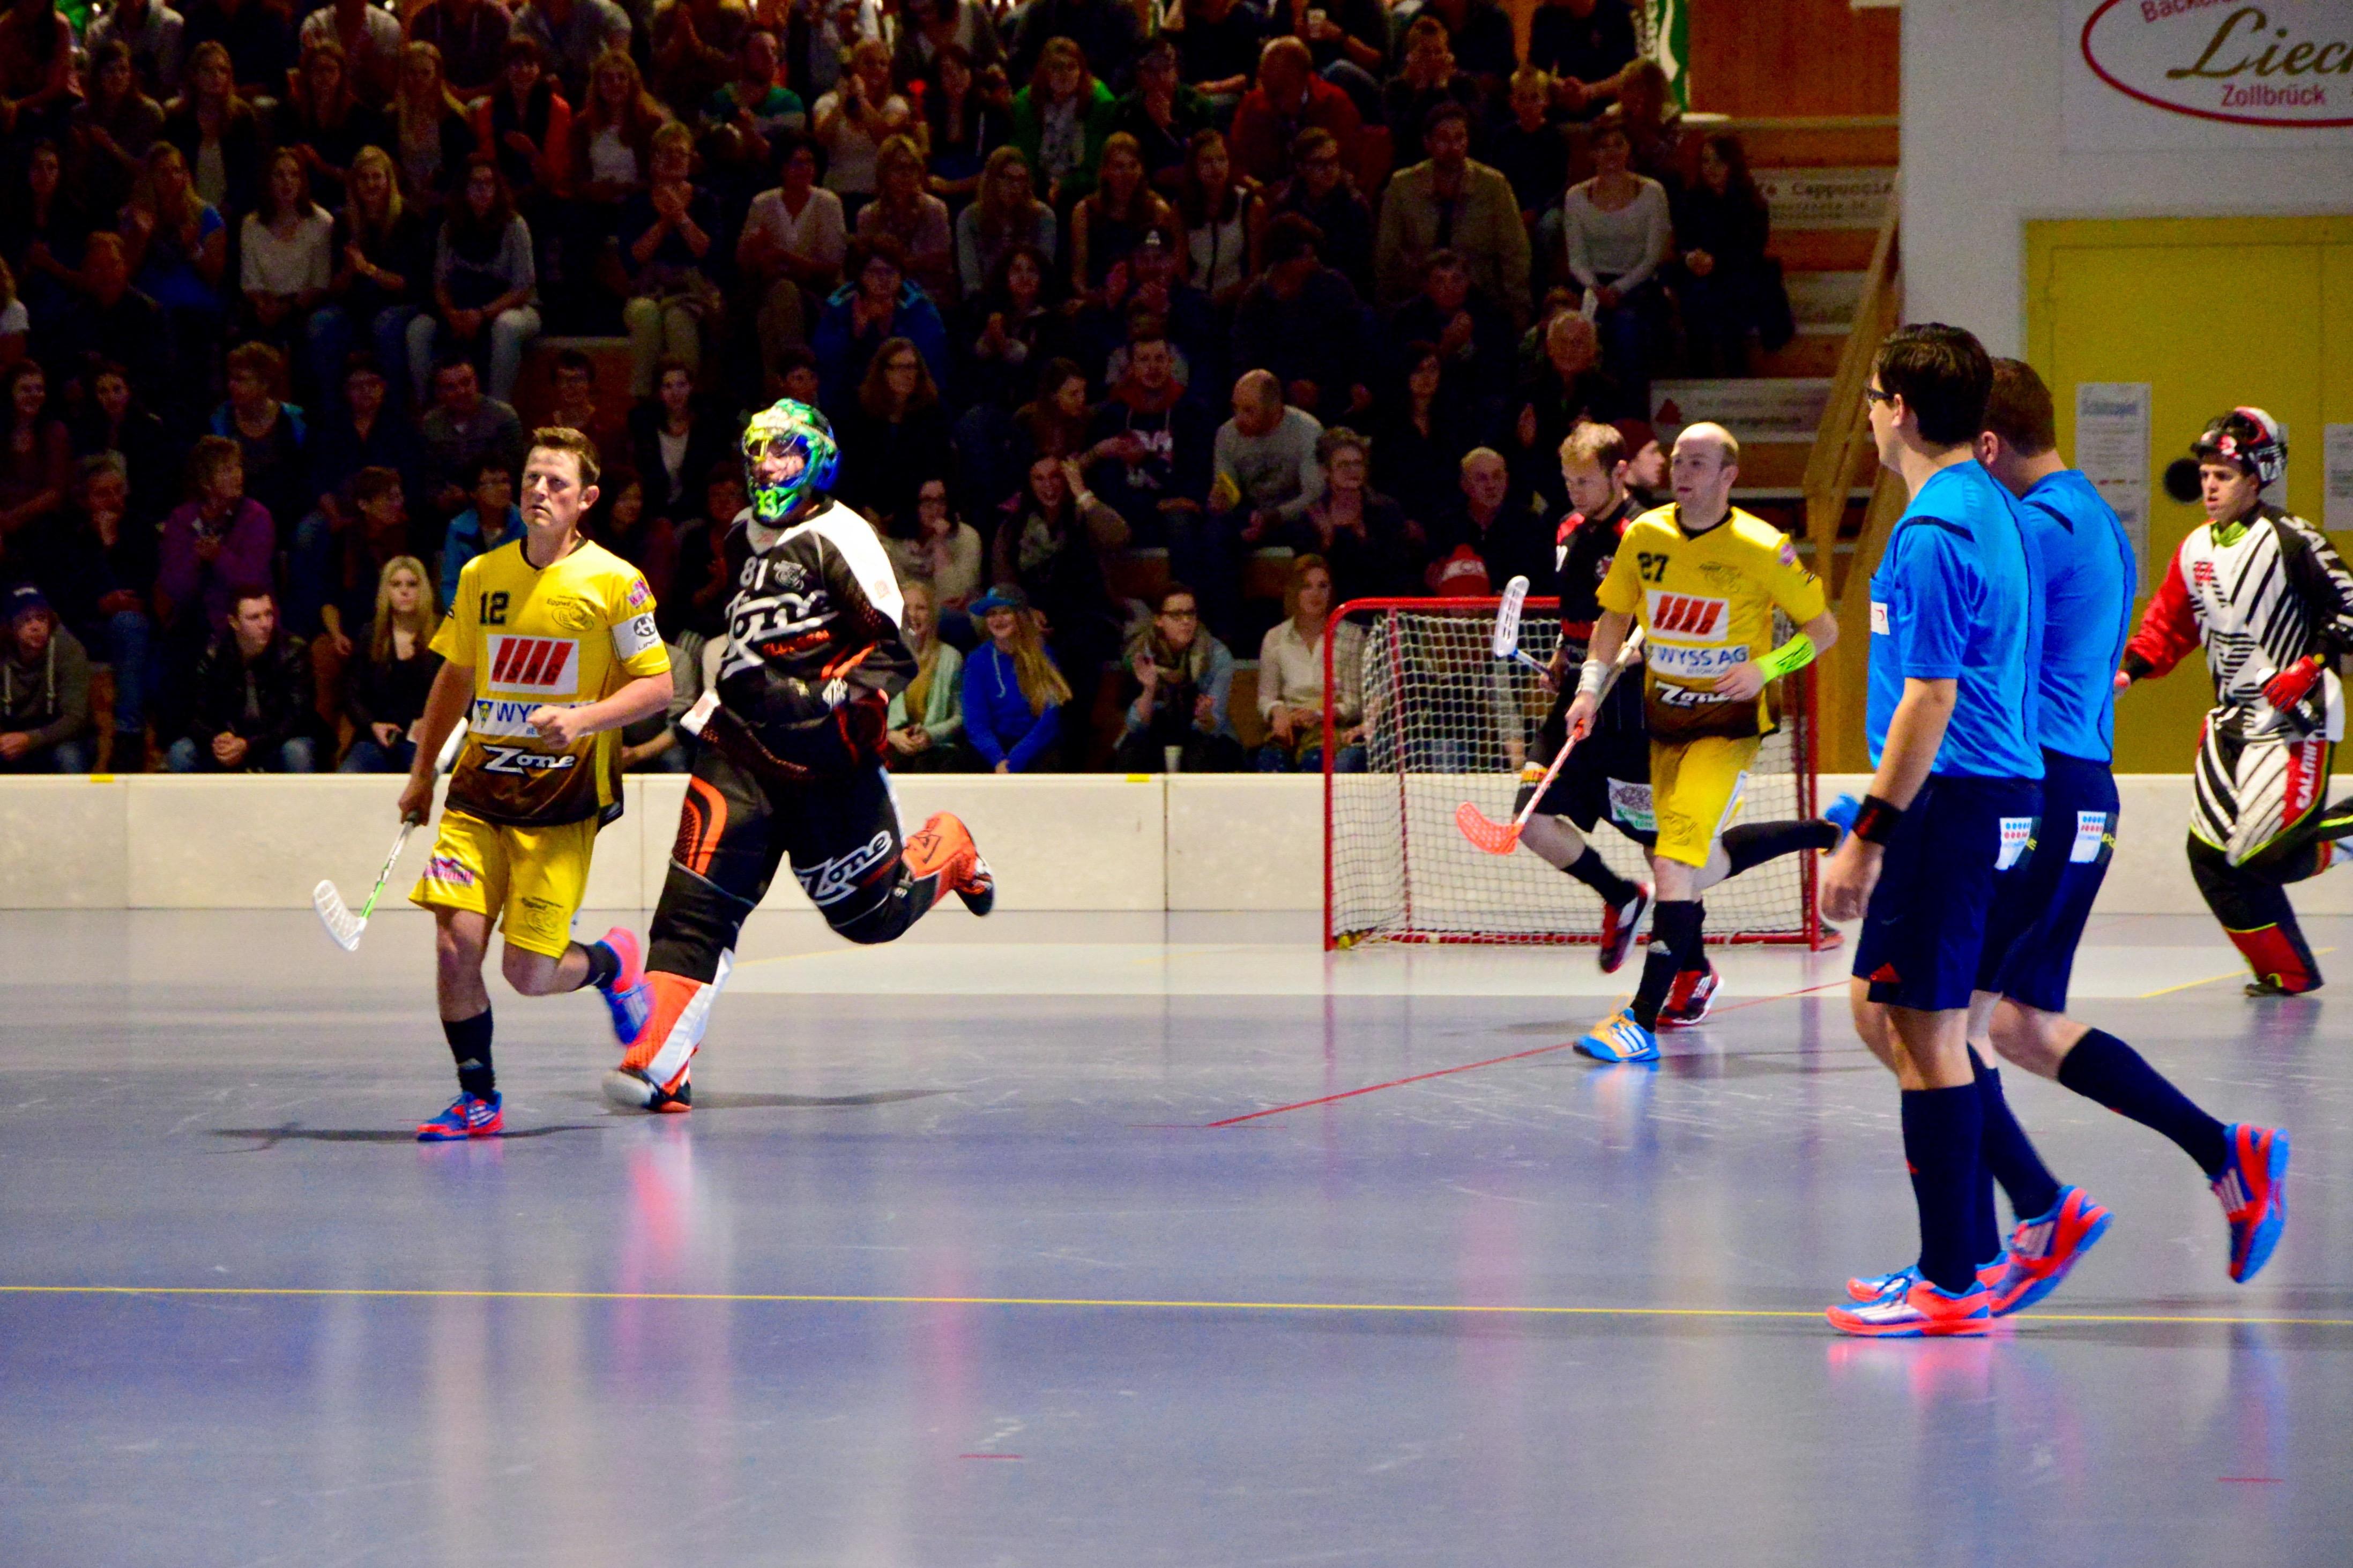 Herren NLB - Red Devils Altendorf II Saison 2014/15